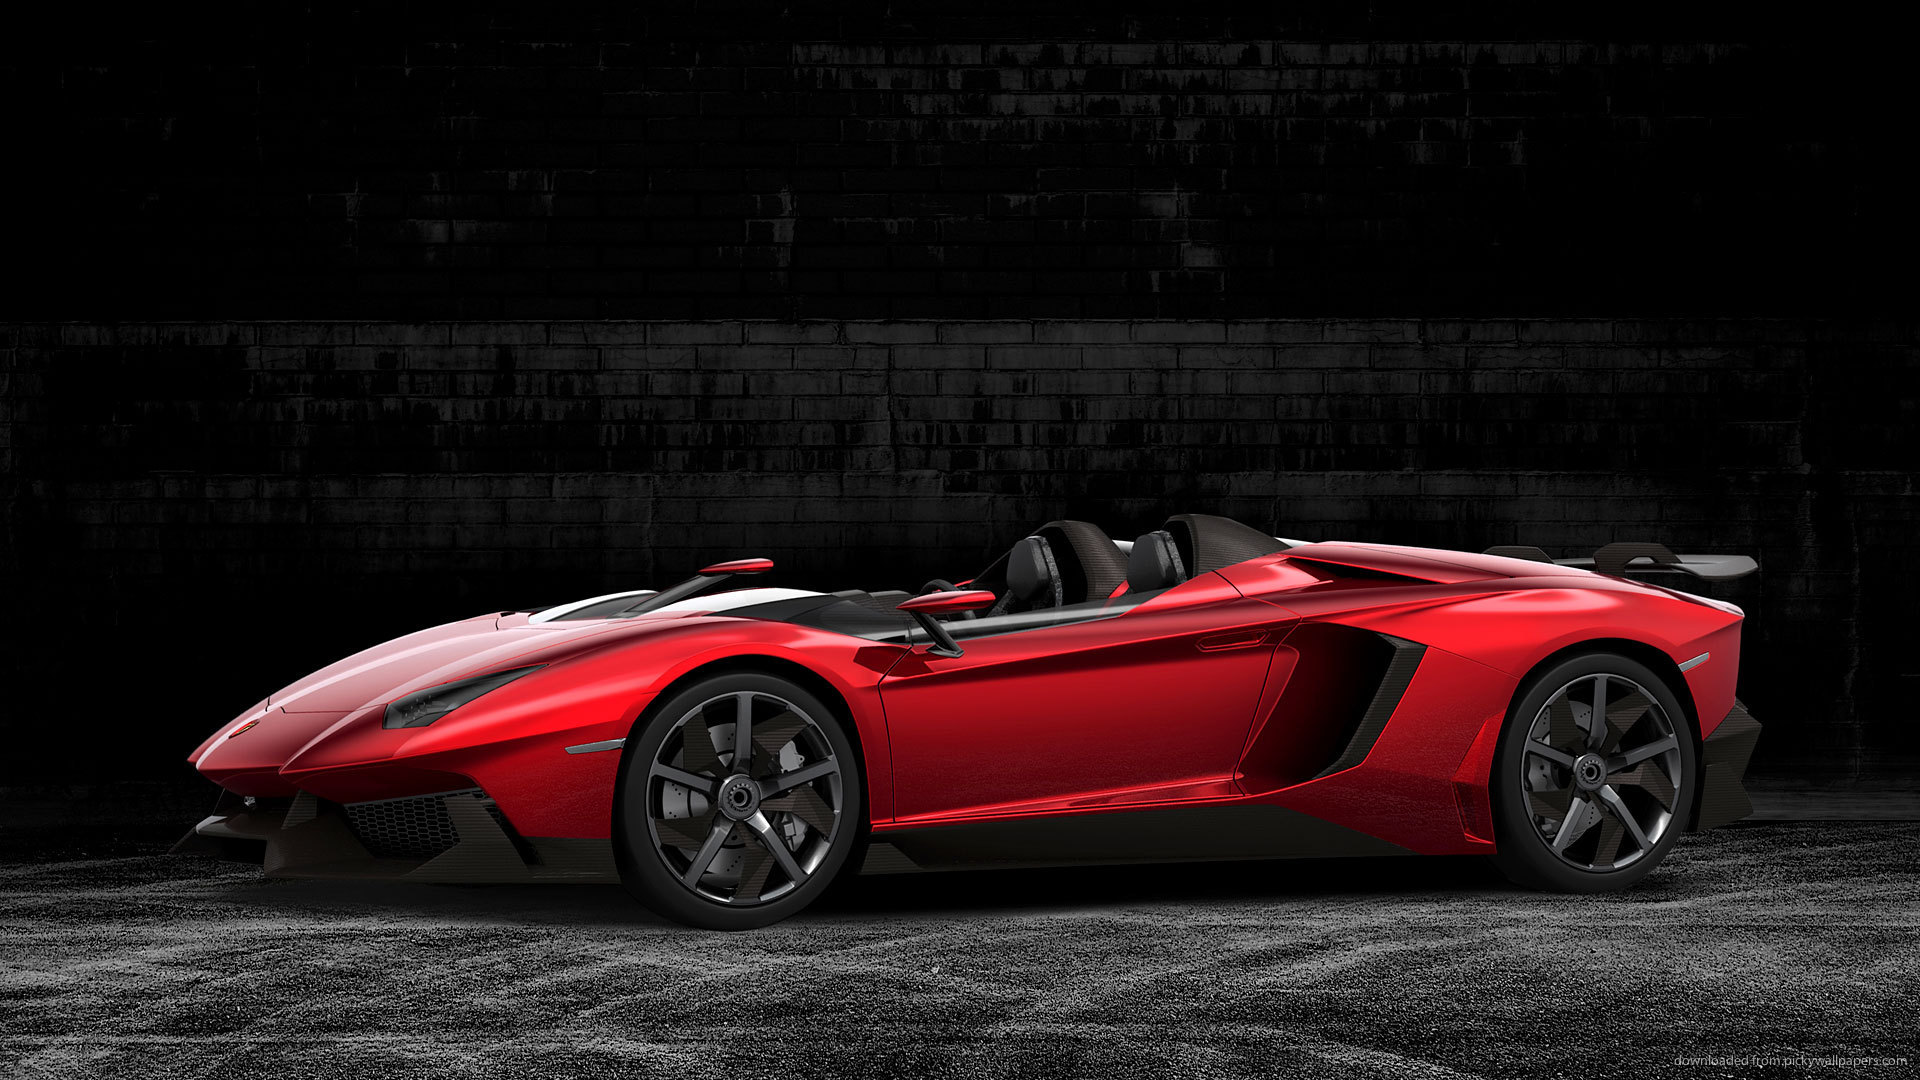 [33+] Lamborghini Aventador Wallpaper 1920x1080 on ...